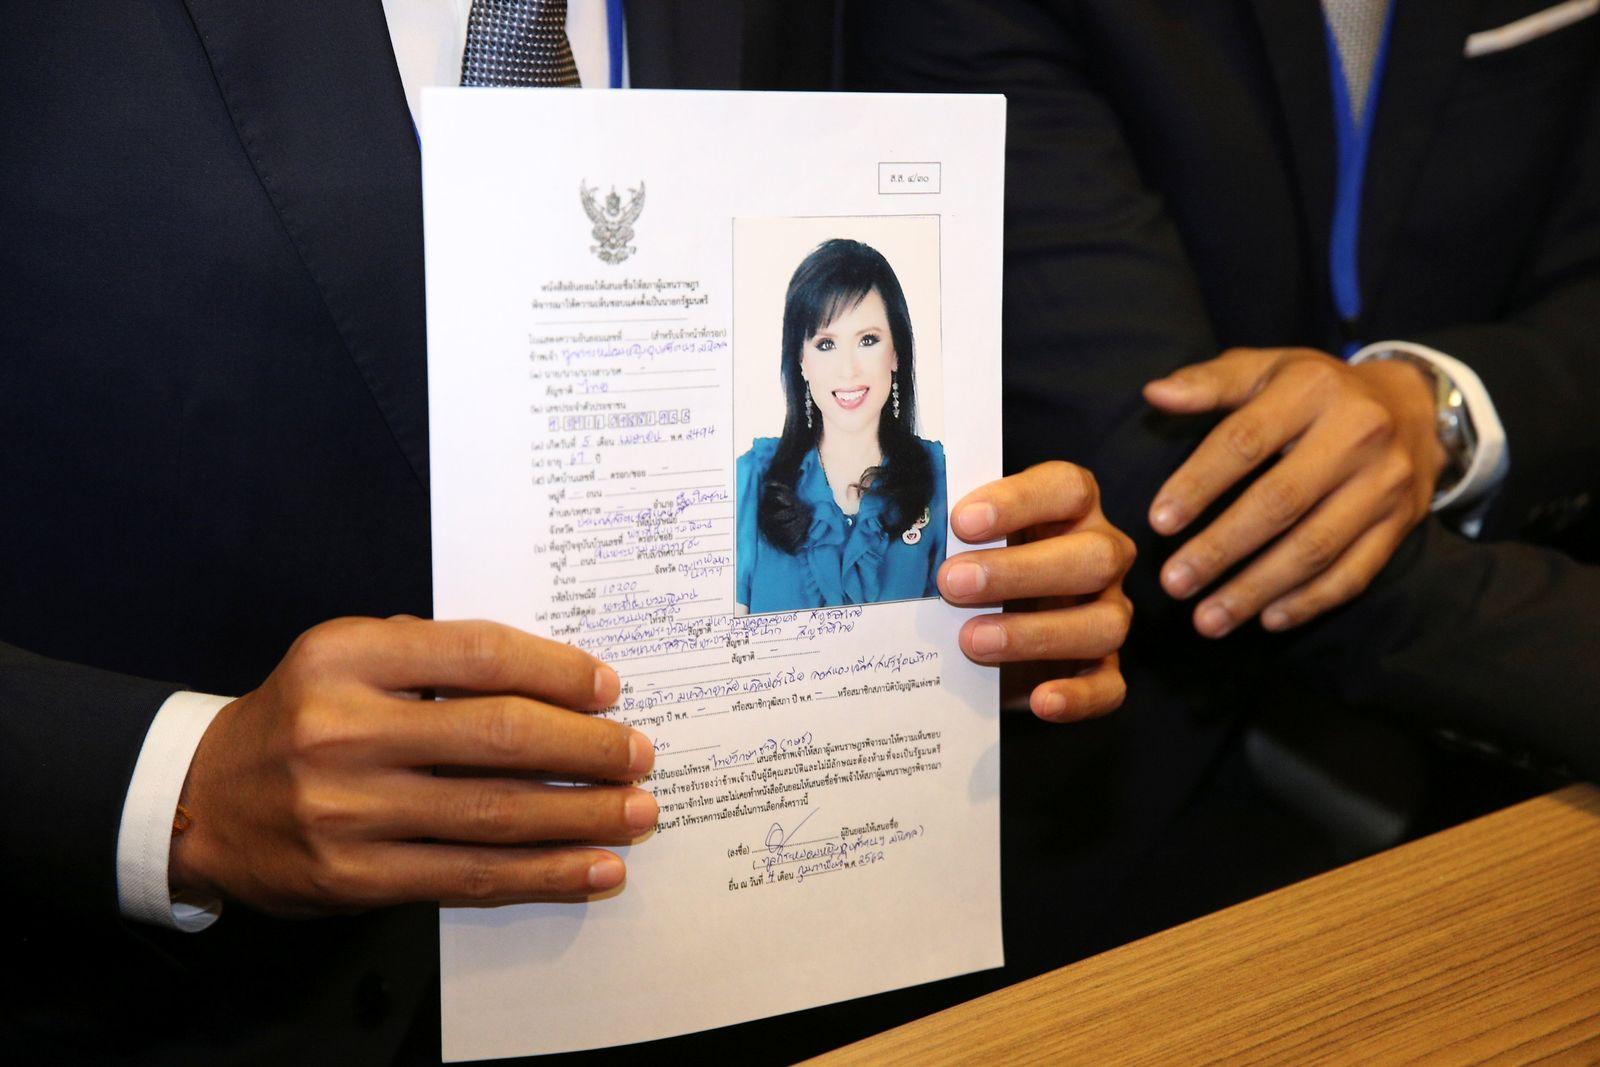 Ubolratana Rajakanya Thailand